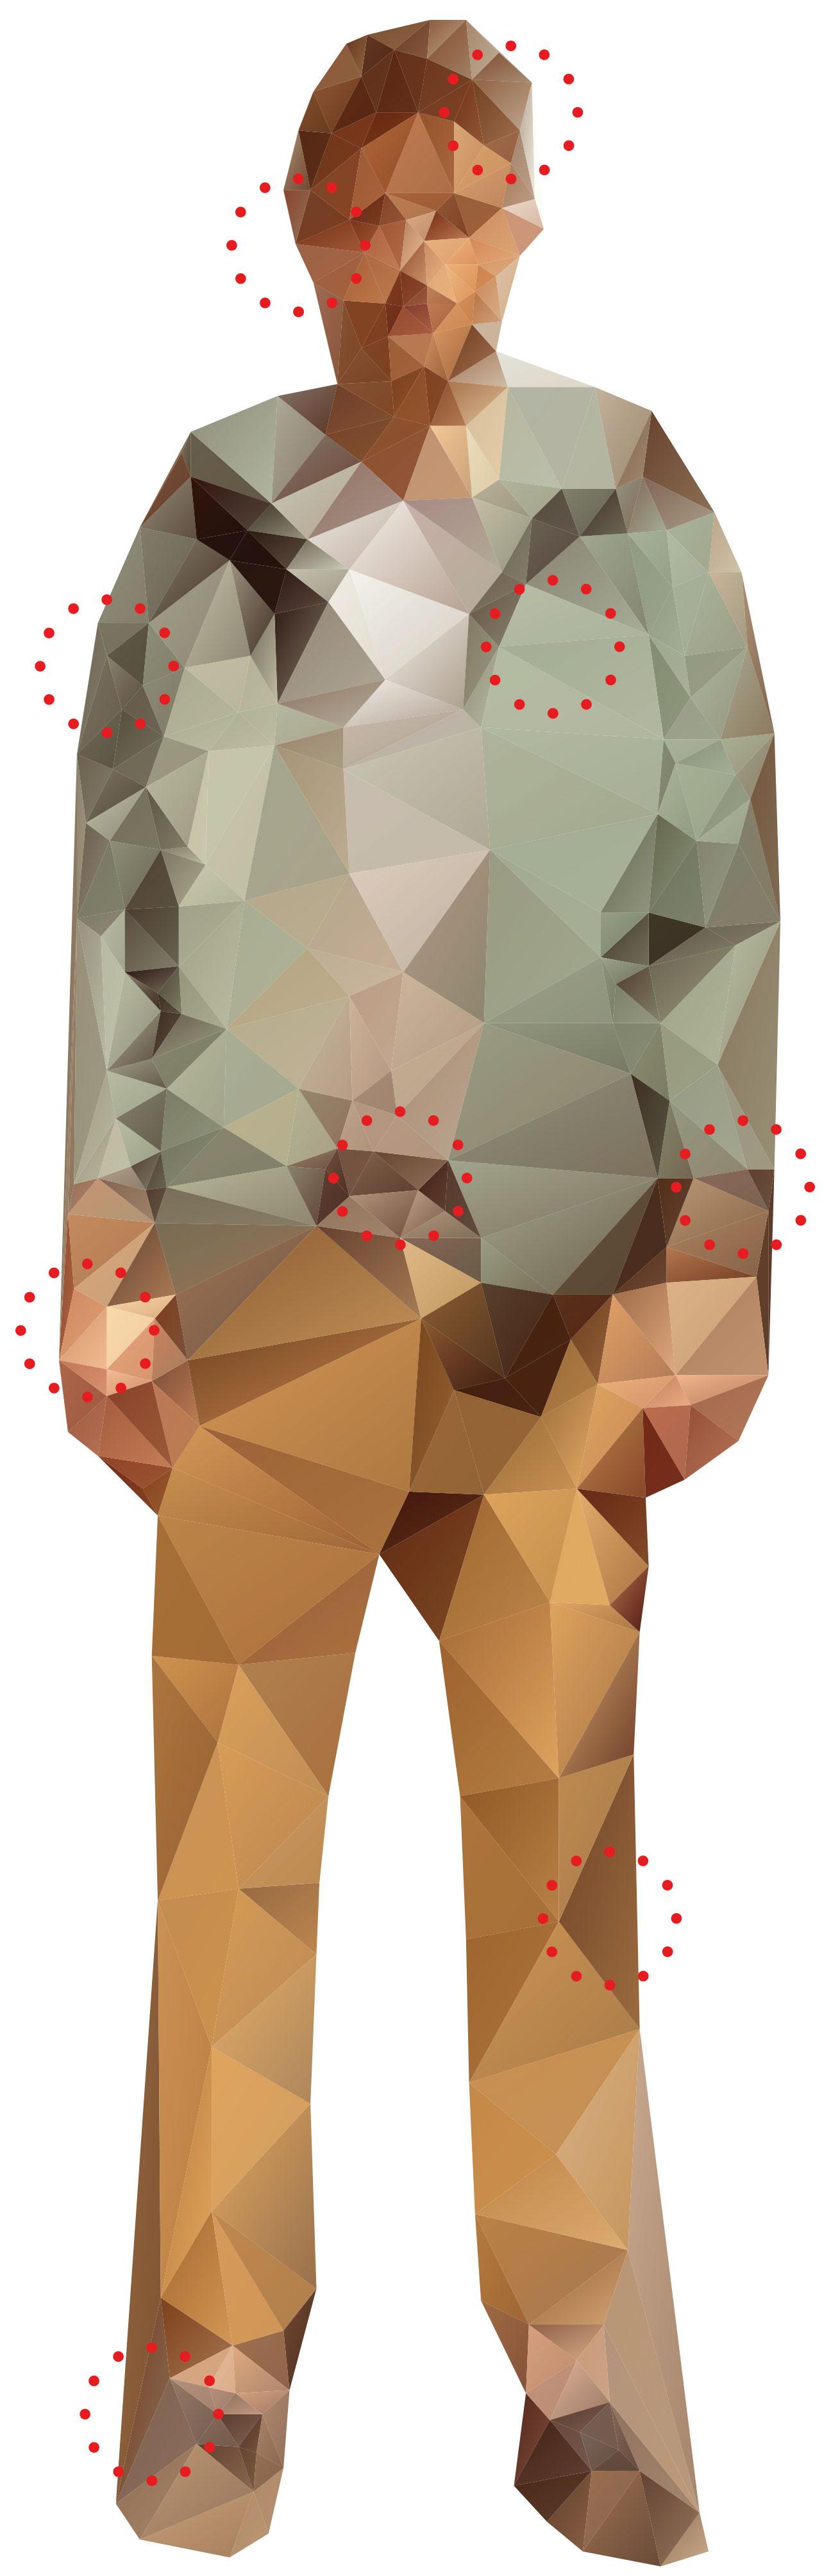 Sensor Planning - Man with Sensors